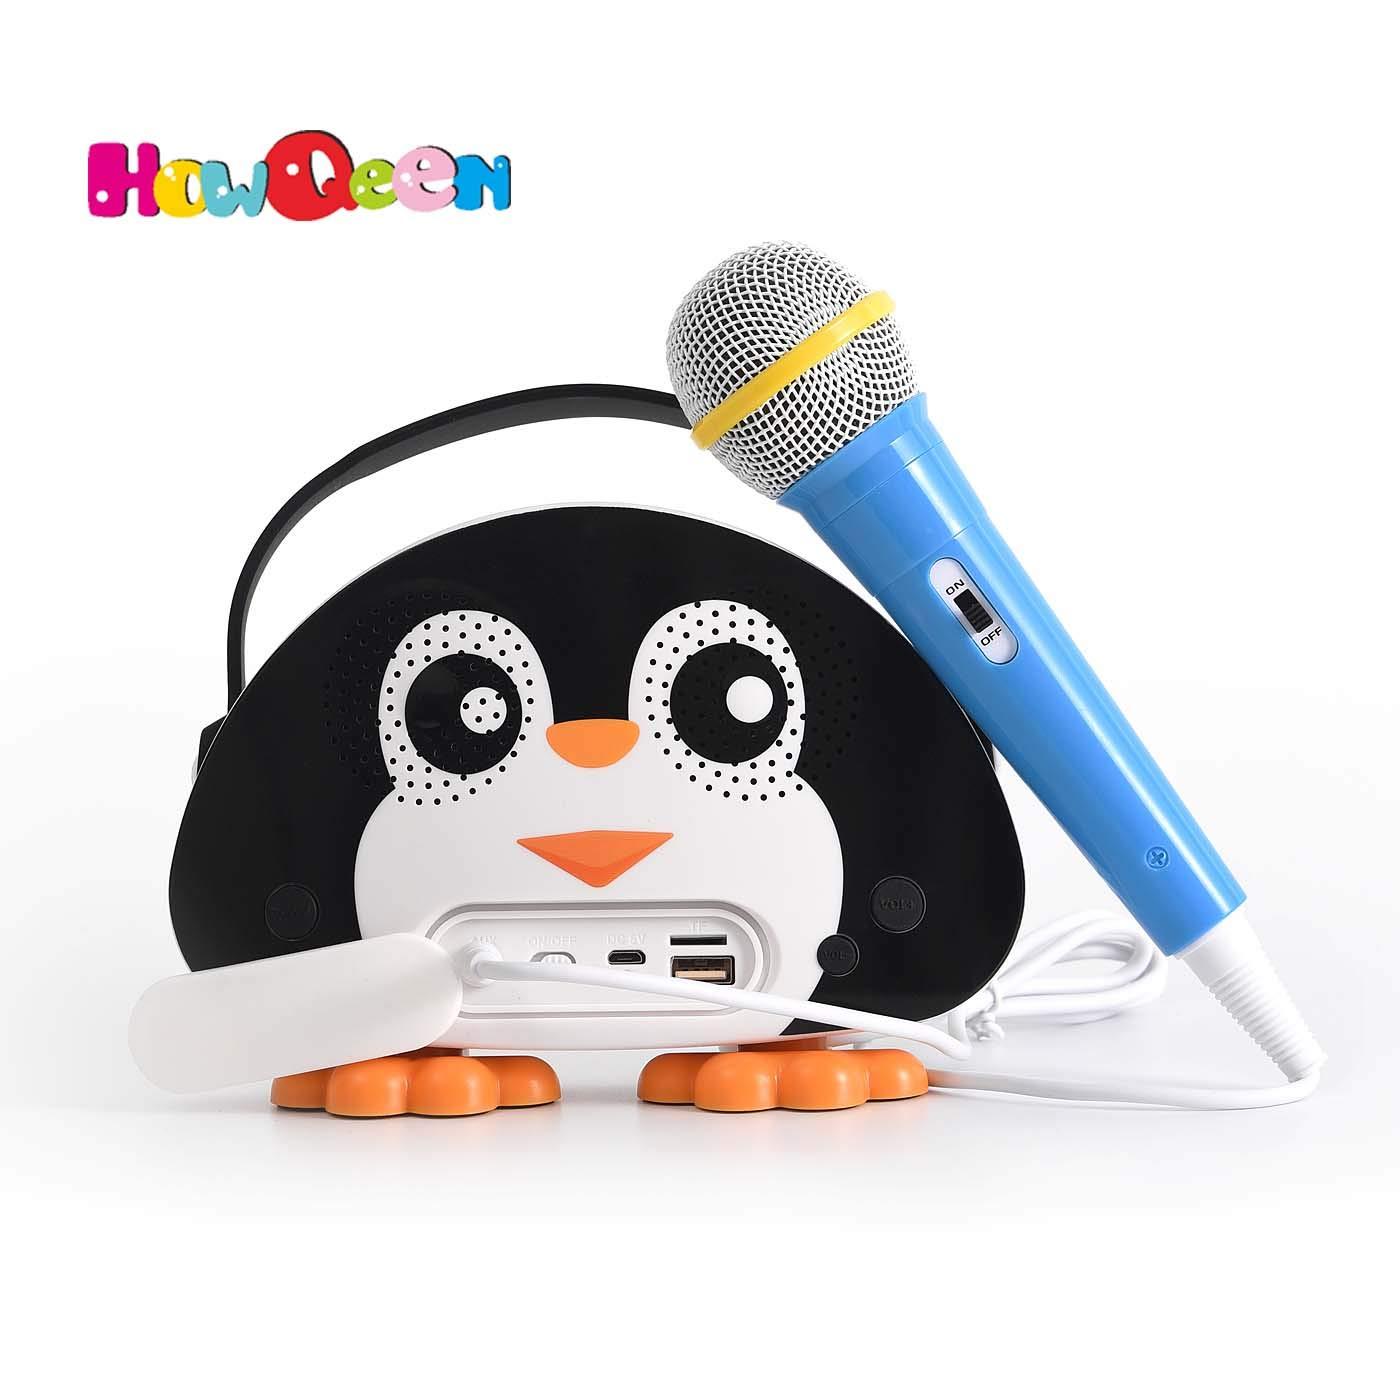 HowQ Outdoor Toys Karaoke Machine , Portable Kids Karaoke Bluetooth Speaker Wireless Cartoon Speaker for Kids for Indoor Toys Travel Activities with Microphone Penguin Karaoke Machine(Black-White)